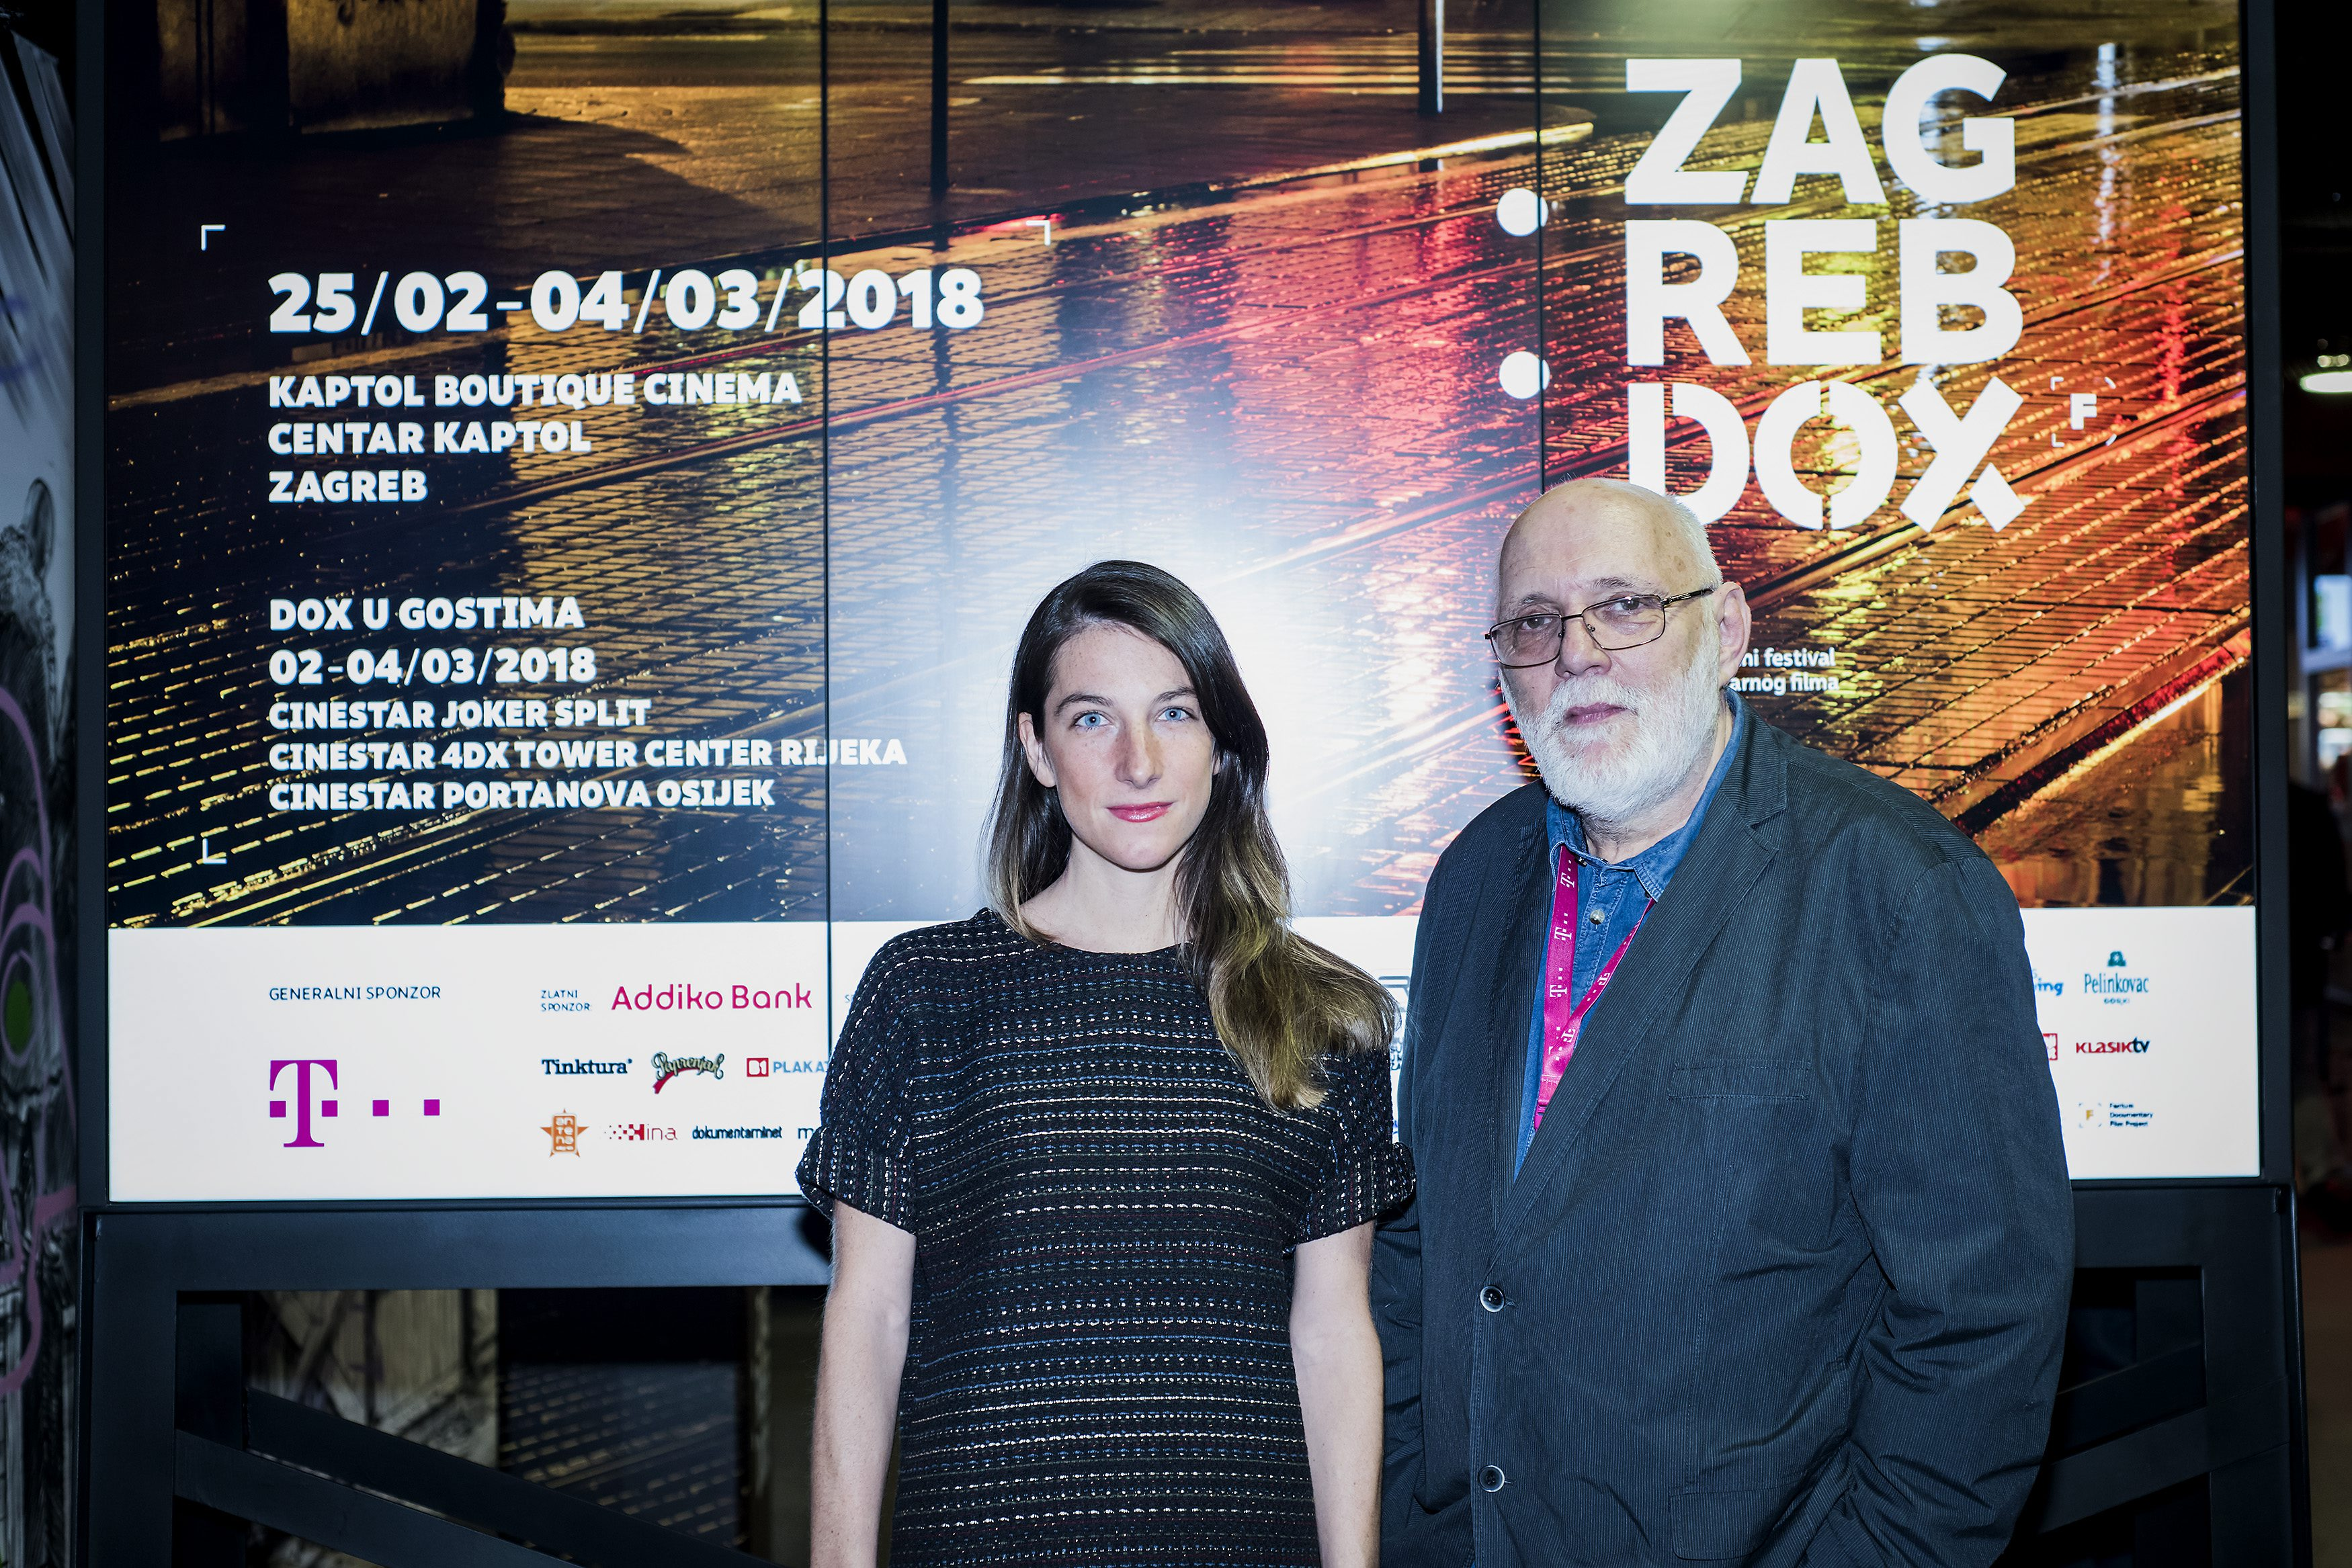 Zagreb, 250218.  Veceras je u Kaptol Bouttique Cinema otvoren 14. ZagrebDox, medjunarodni festival dokumentarnog filma. Na fotografiji: Nenad Puhovski. Foto: Neja Markicevic / CROPIX